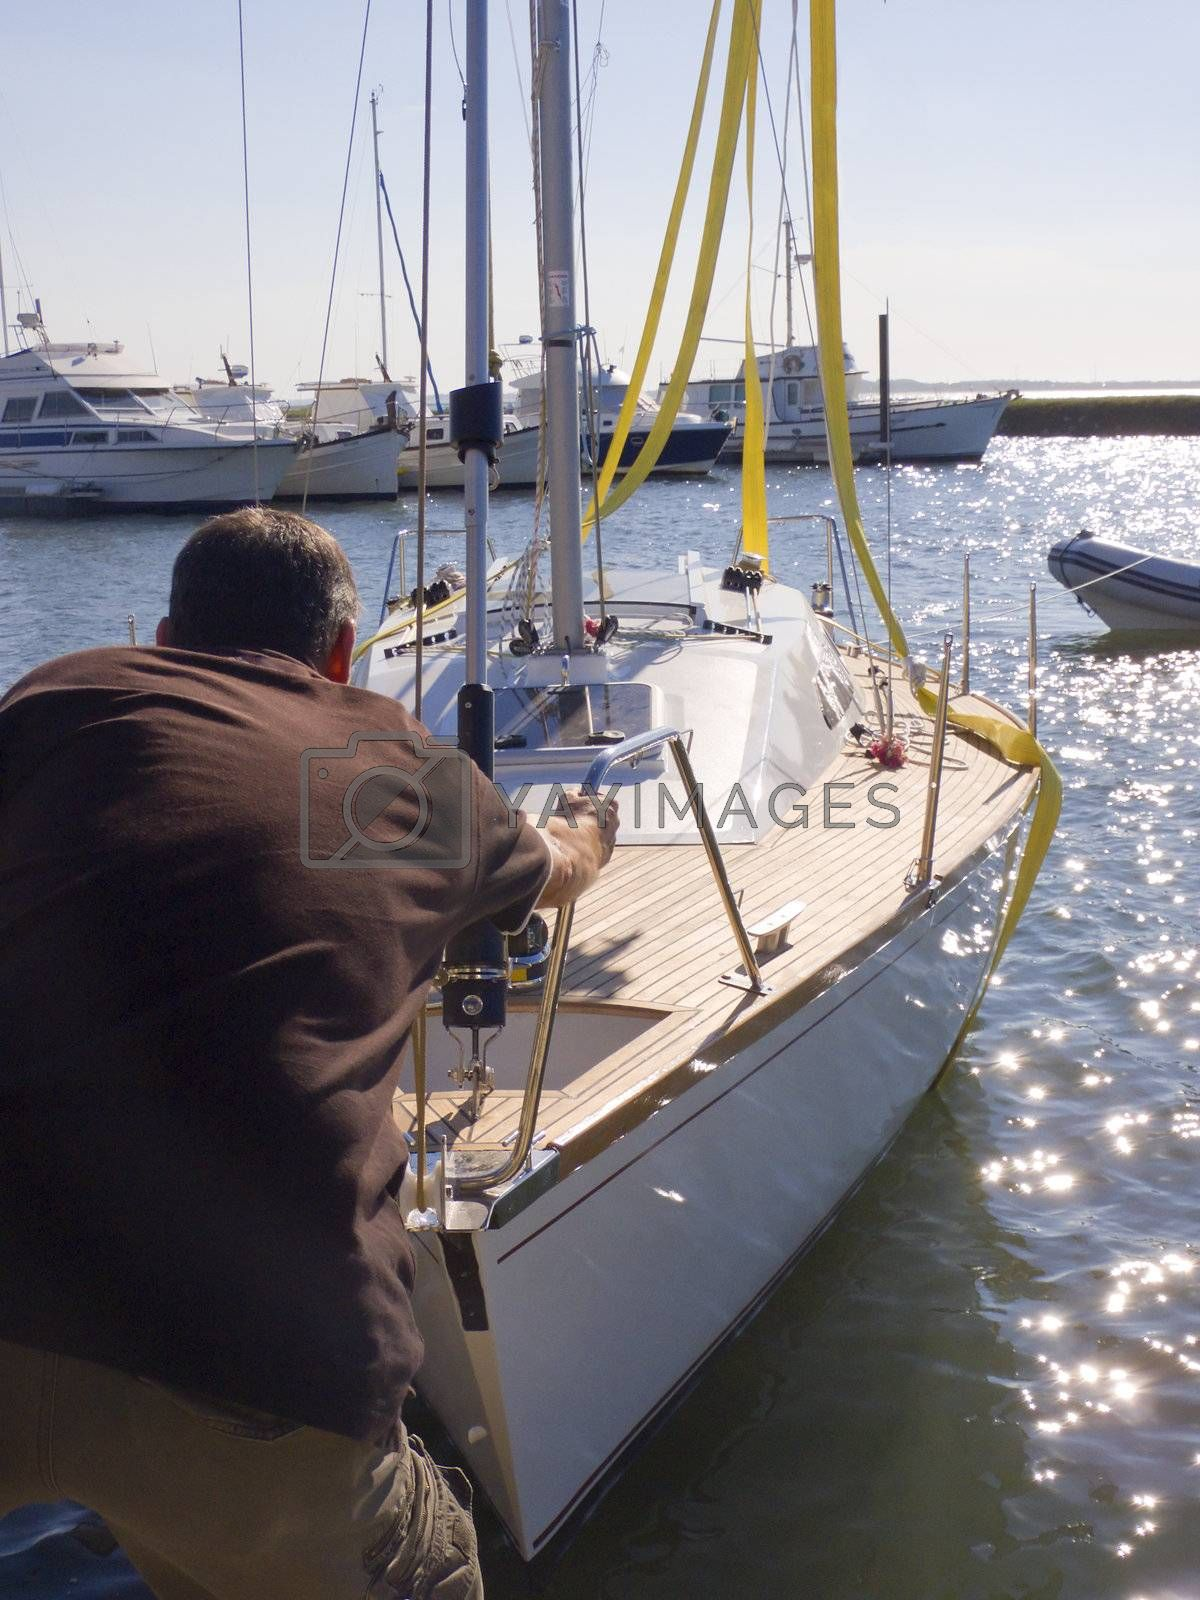 Men grabing intoo a ship by PauloResende